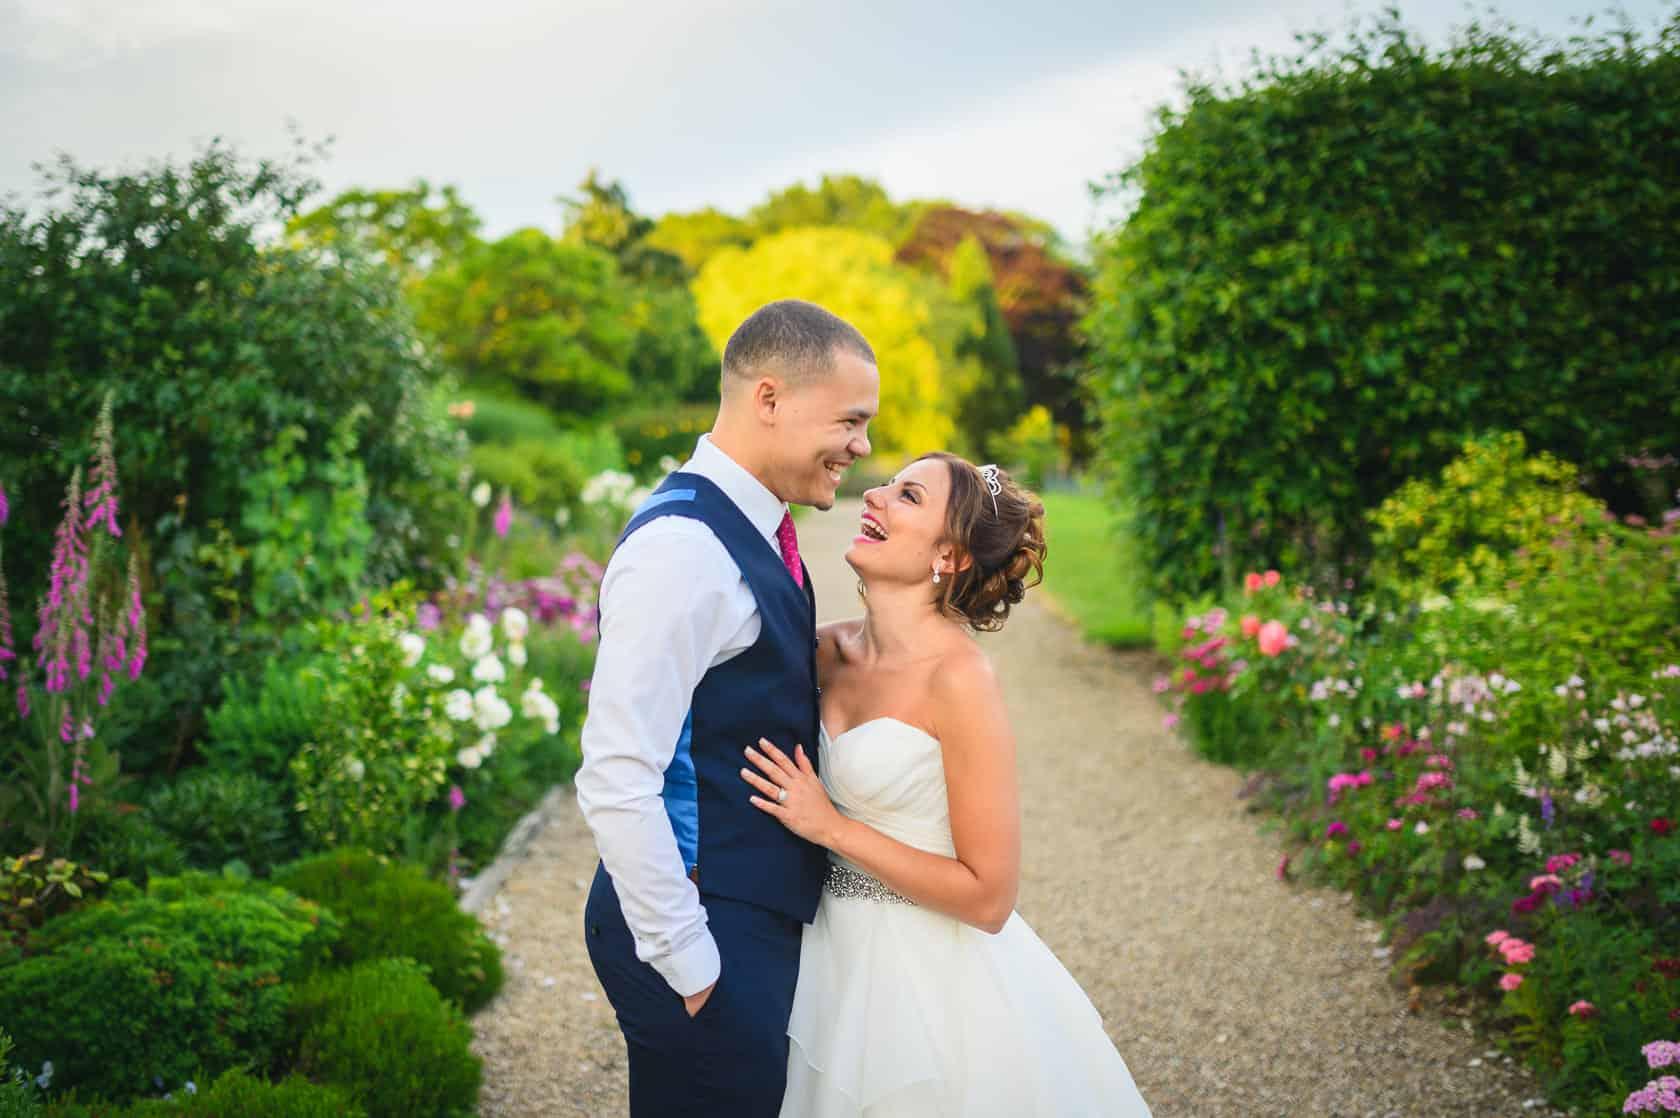 Best_Wedding_Photography_2019_Wedding-Photographer-Essex_014